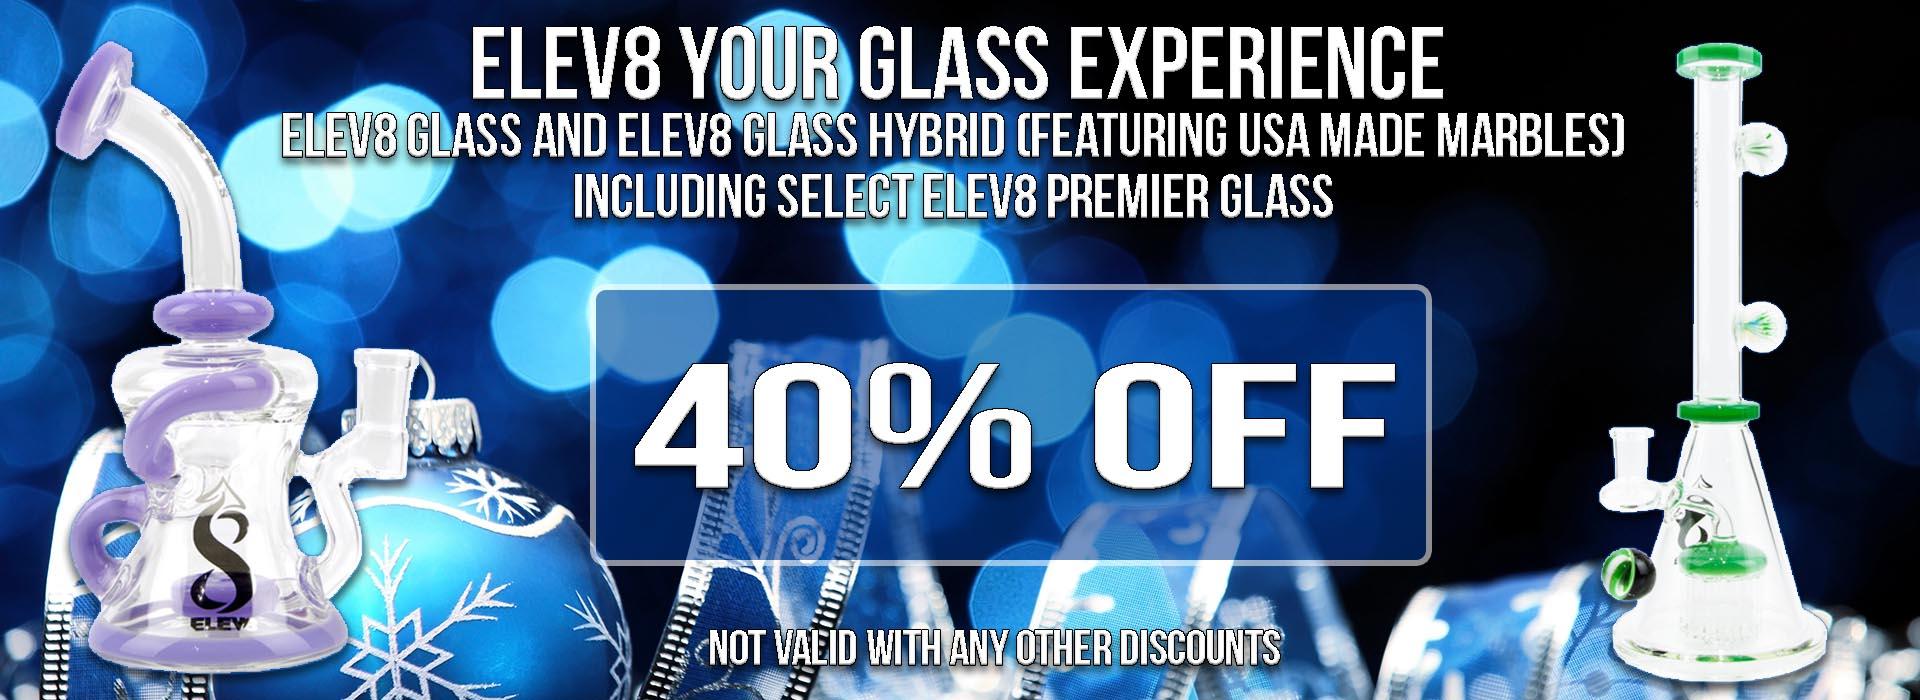 elev8-glass-christmas-sale-hot-deasl.jpg